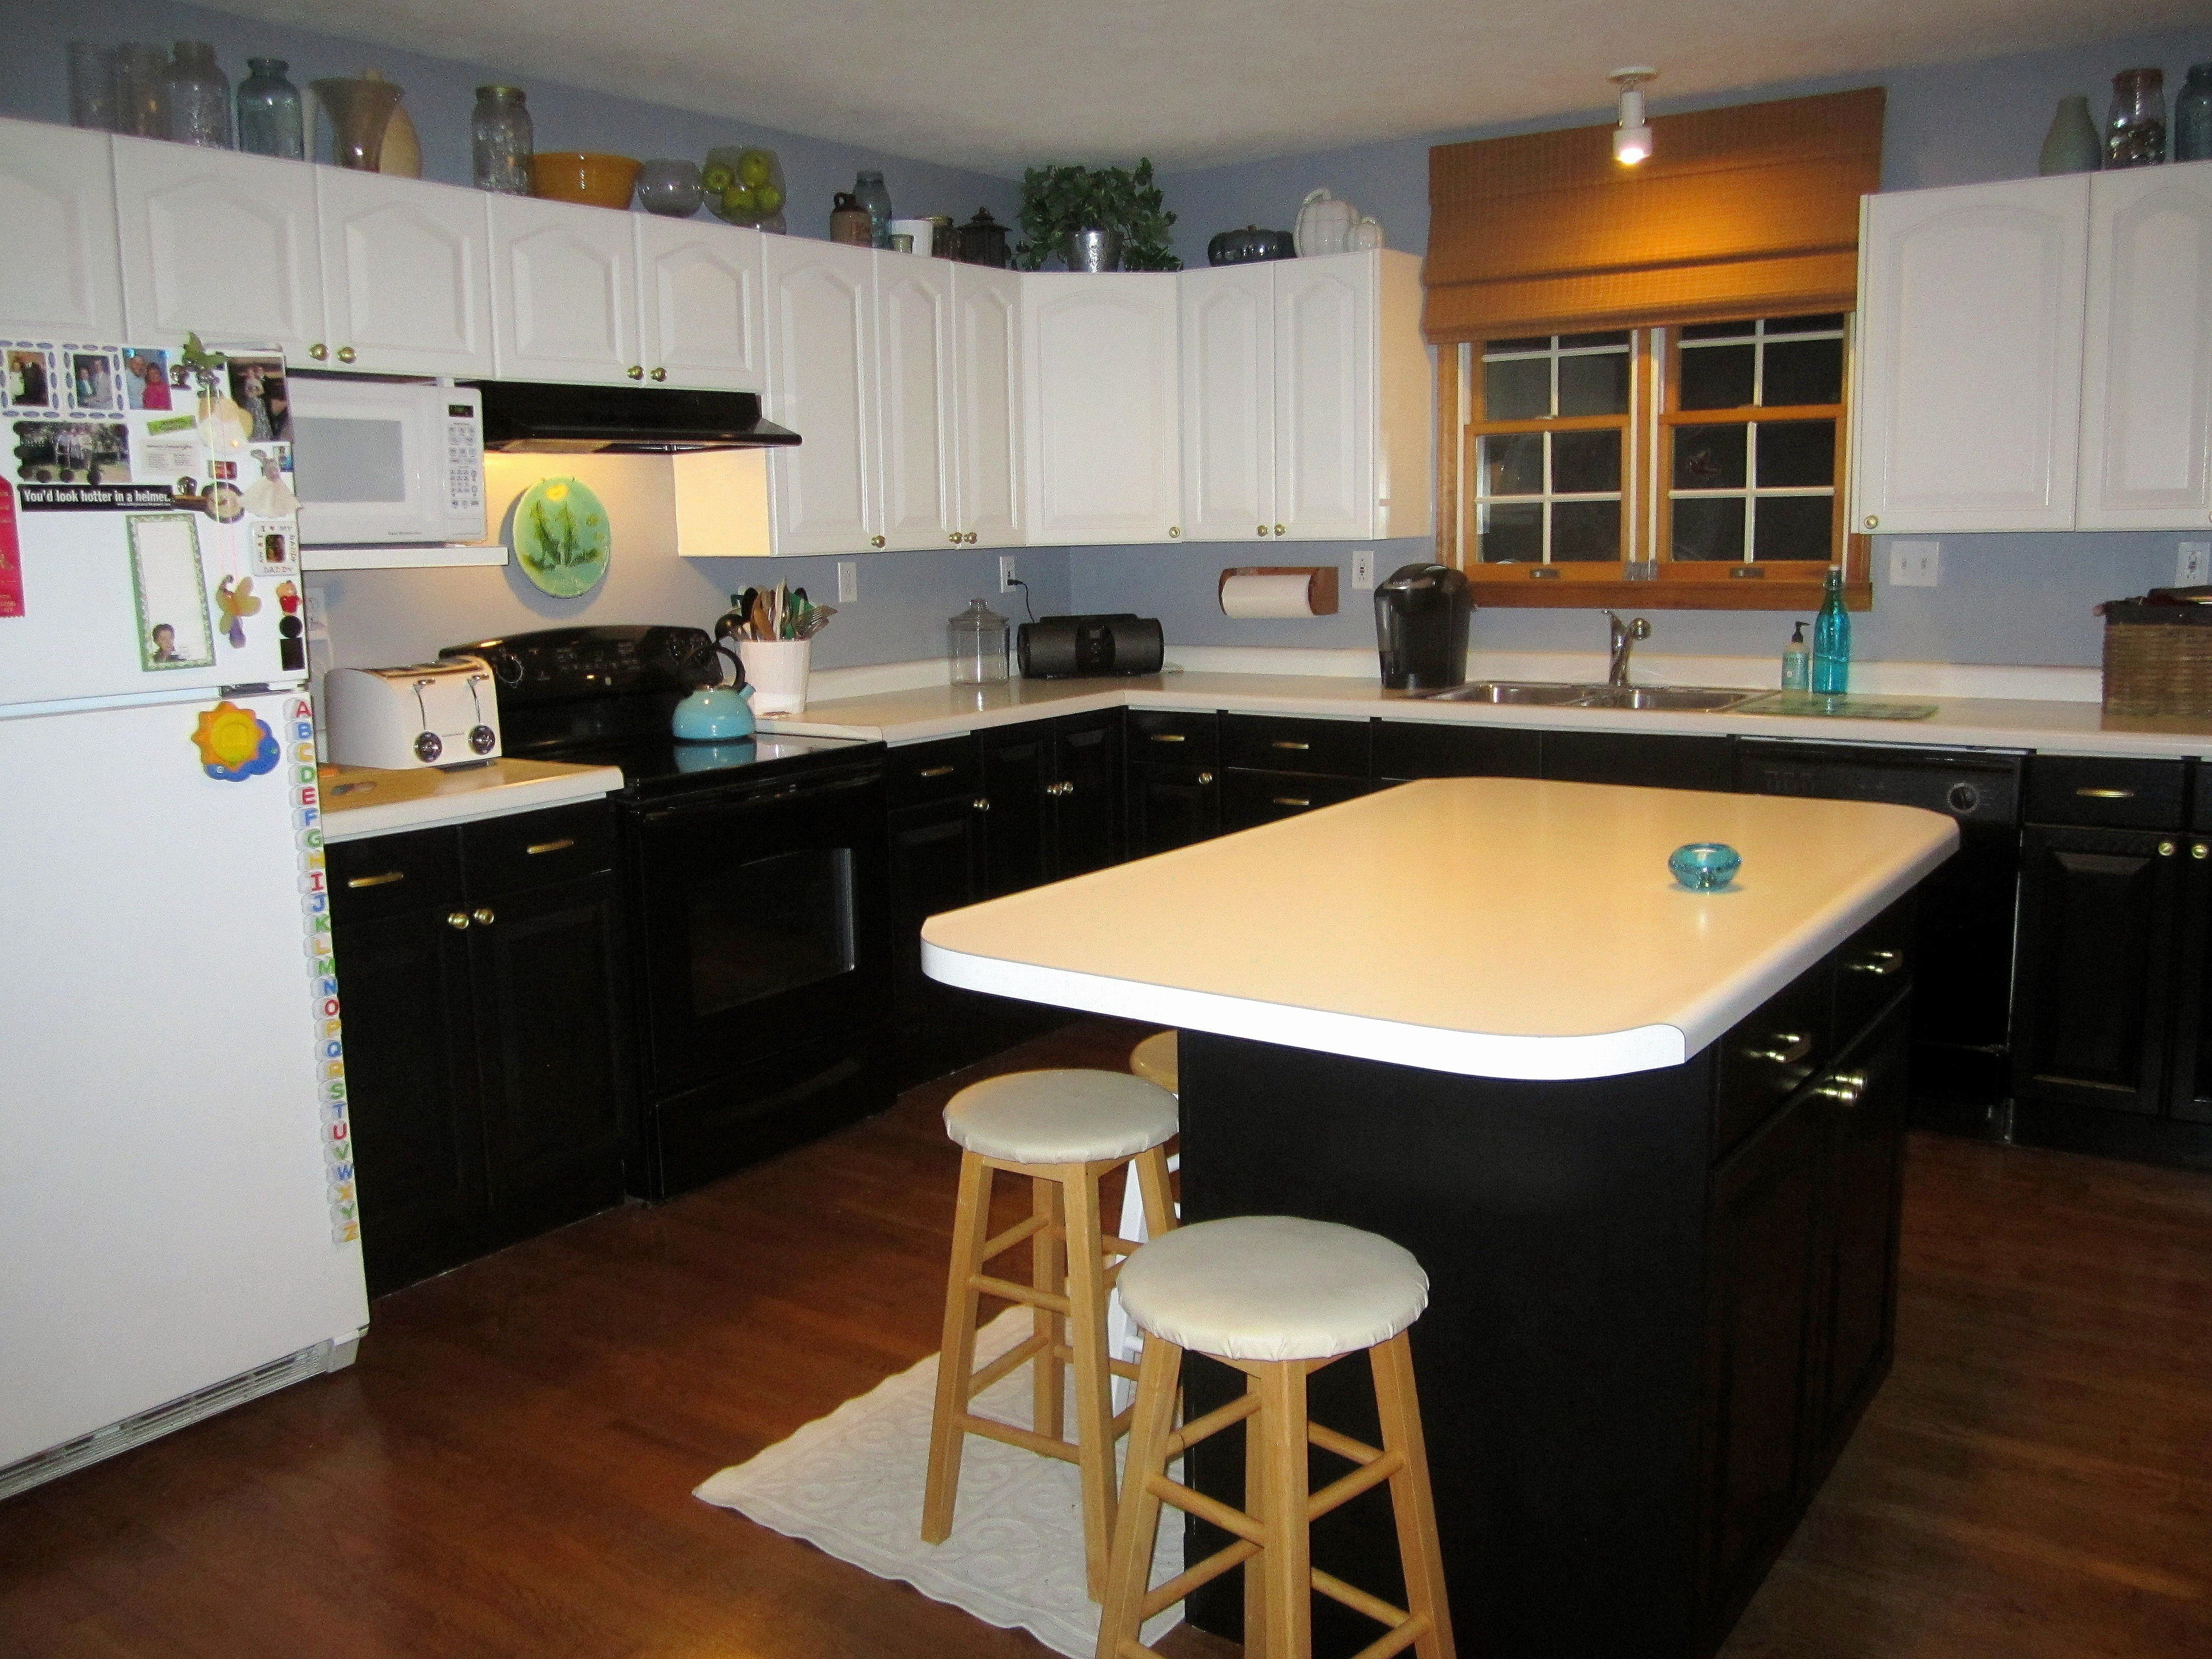 stunning kitchen cabinet ratings | luxury kitchen cabinets, kitchen cabinets, small kitchen